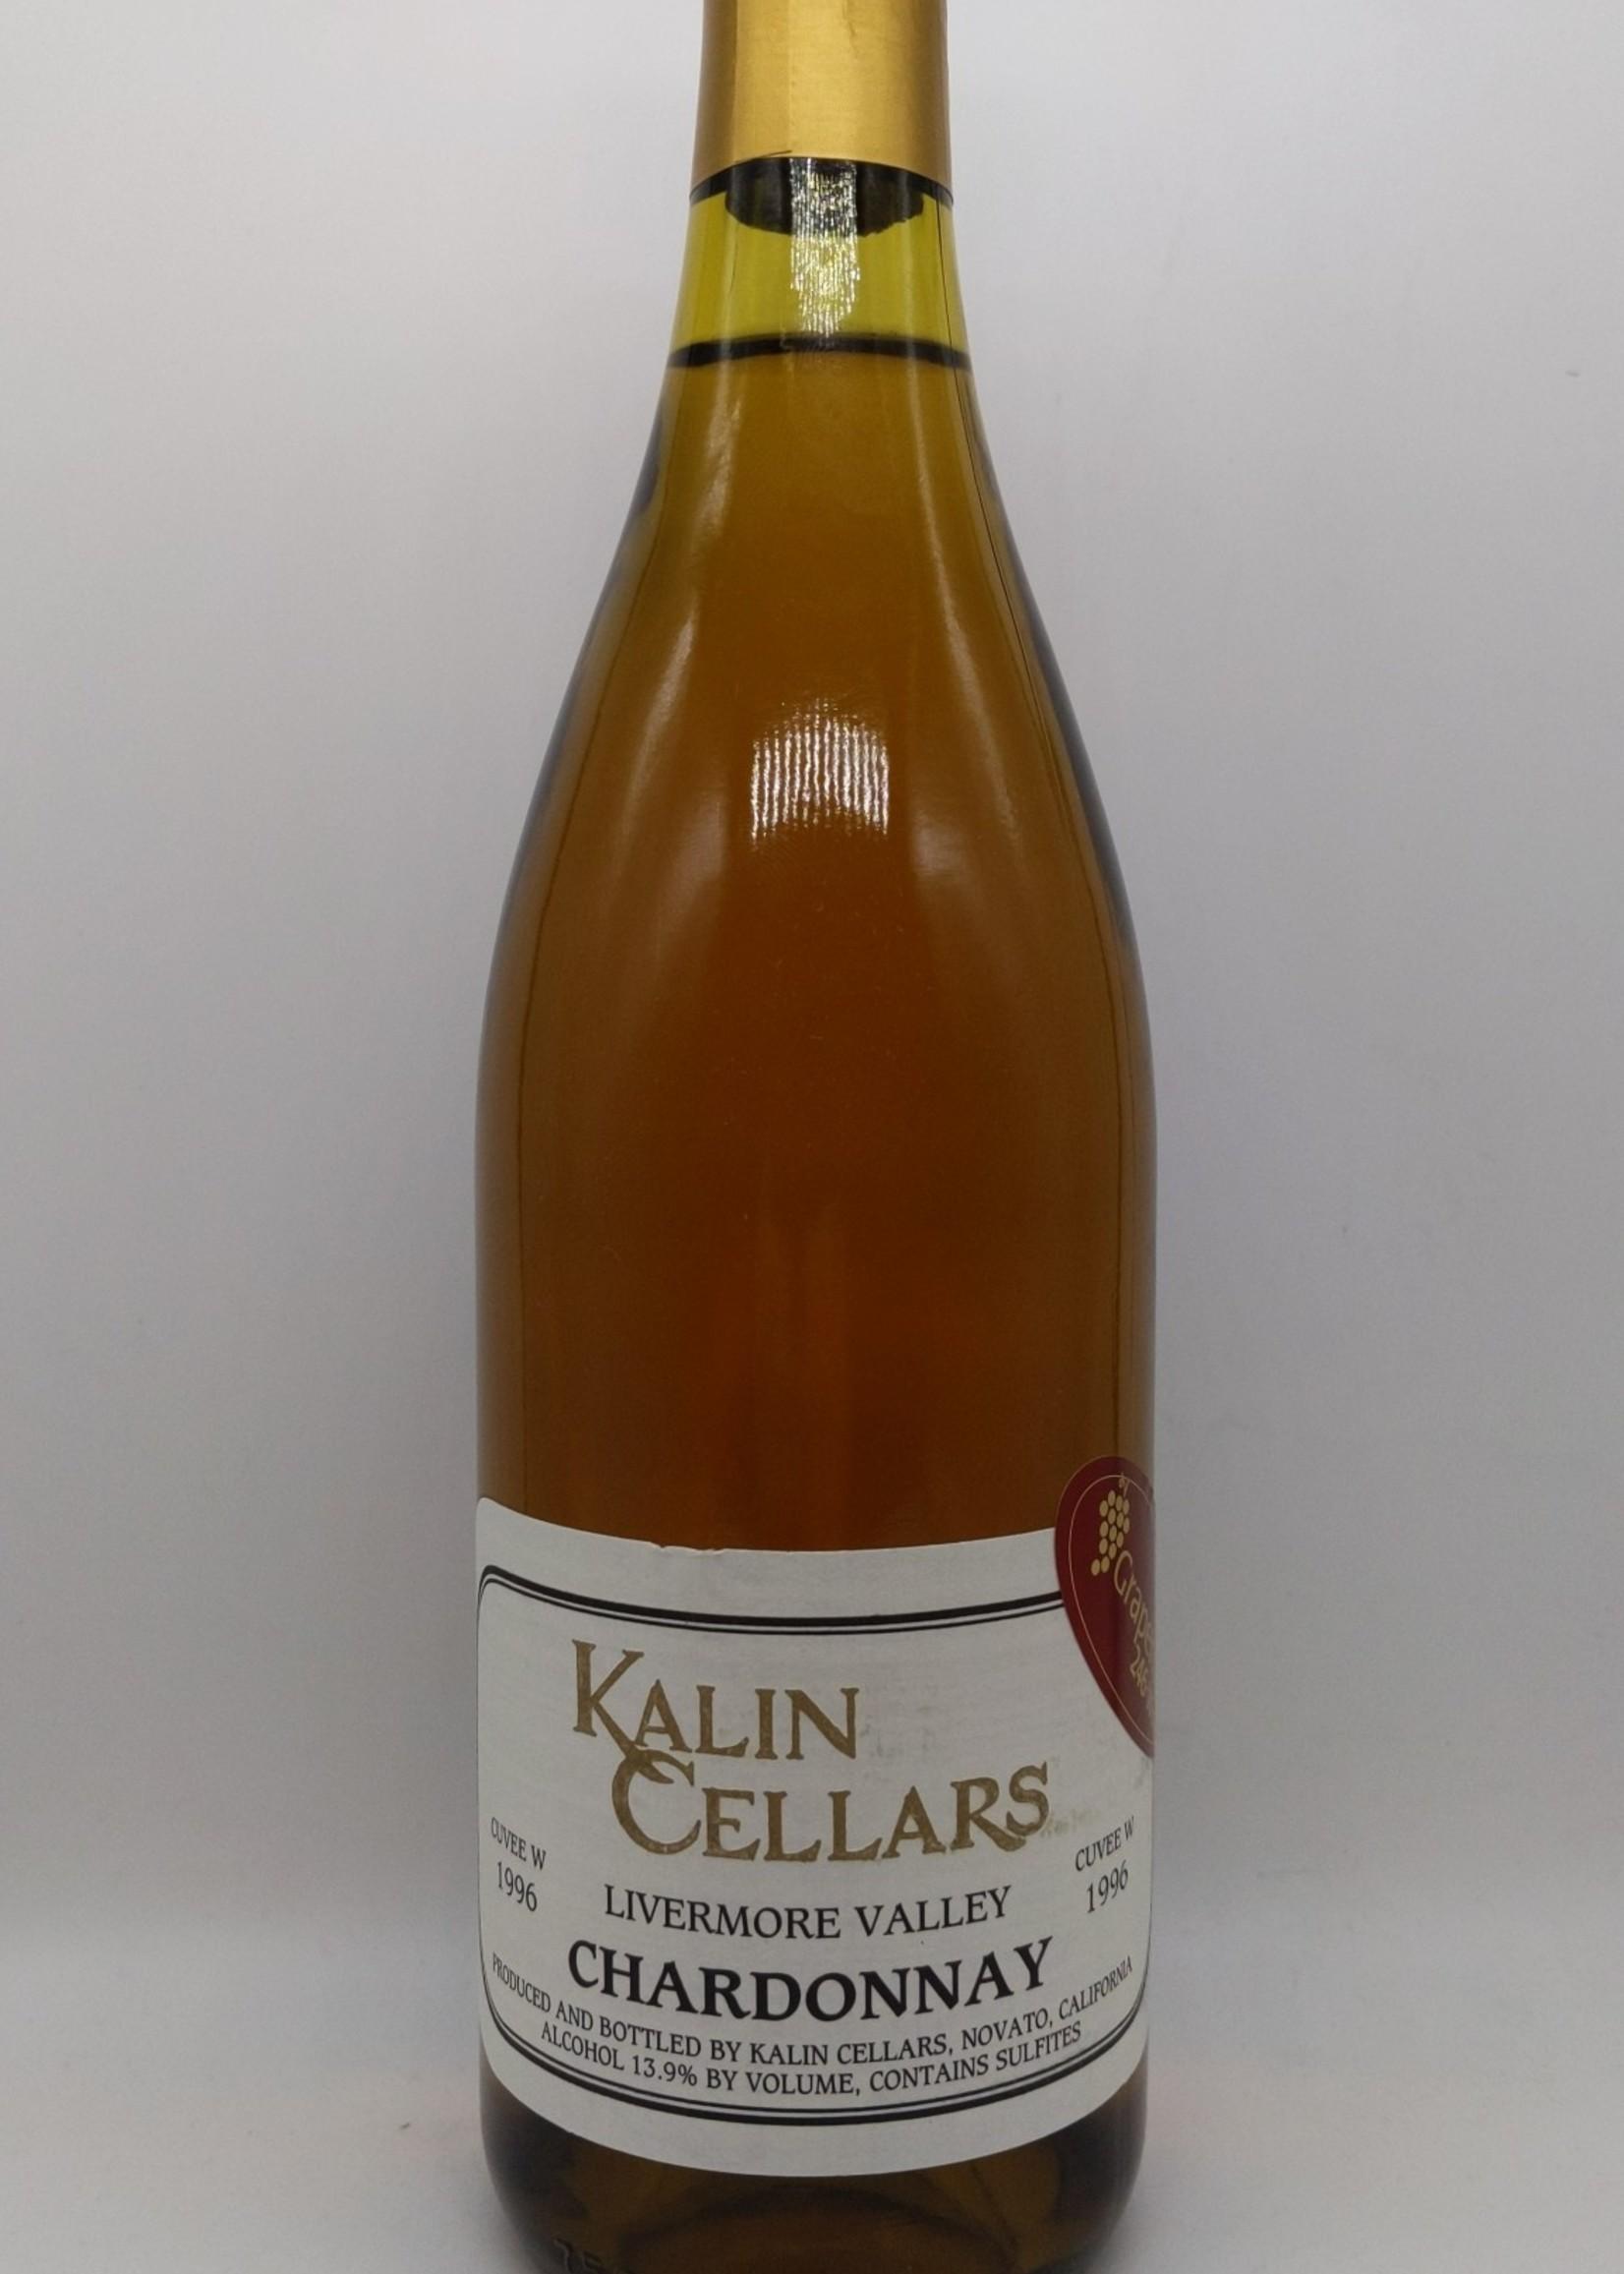 1996 KALIN CELLARS LIVERMORE VALLEY CHARDONNAY 750ml